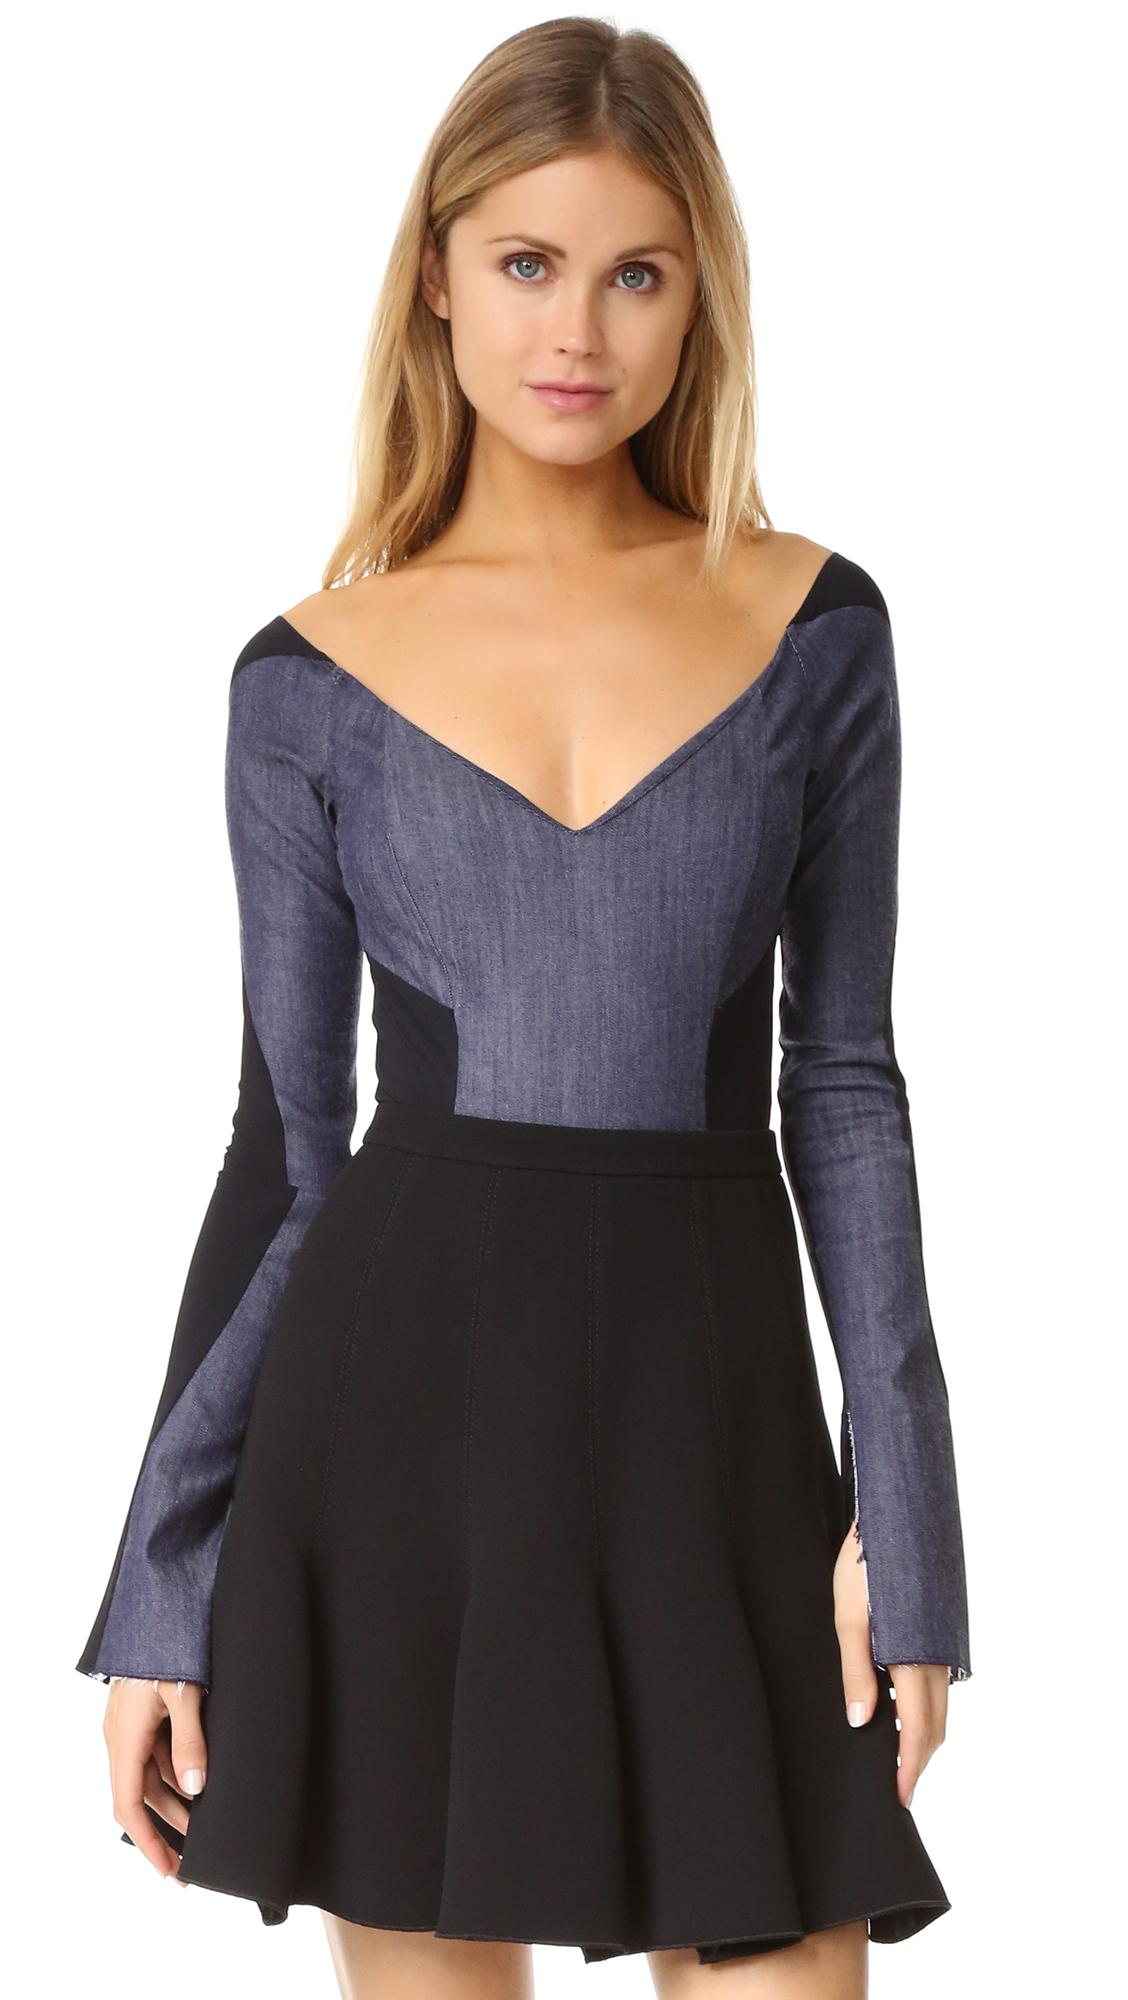 Alix Jones Bodysuit - Denim/Black at Shopbop